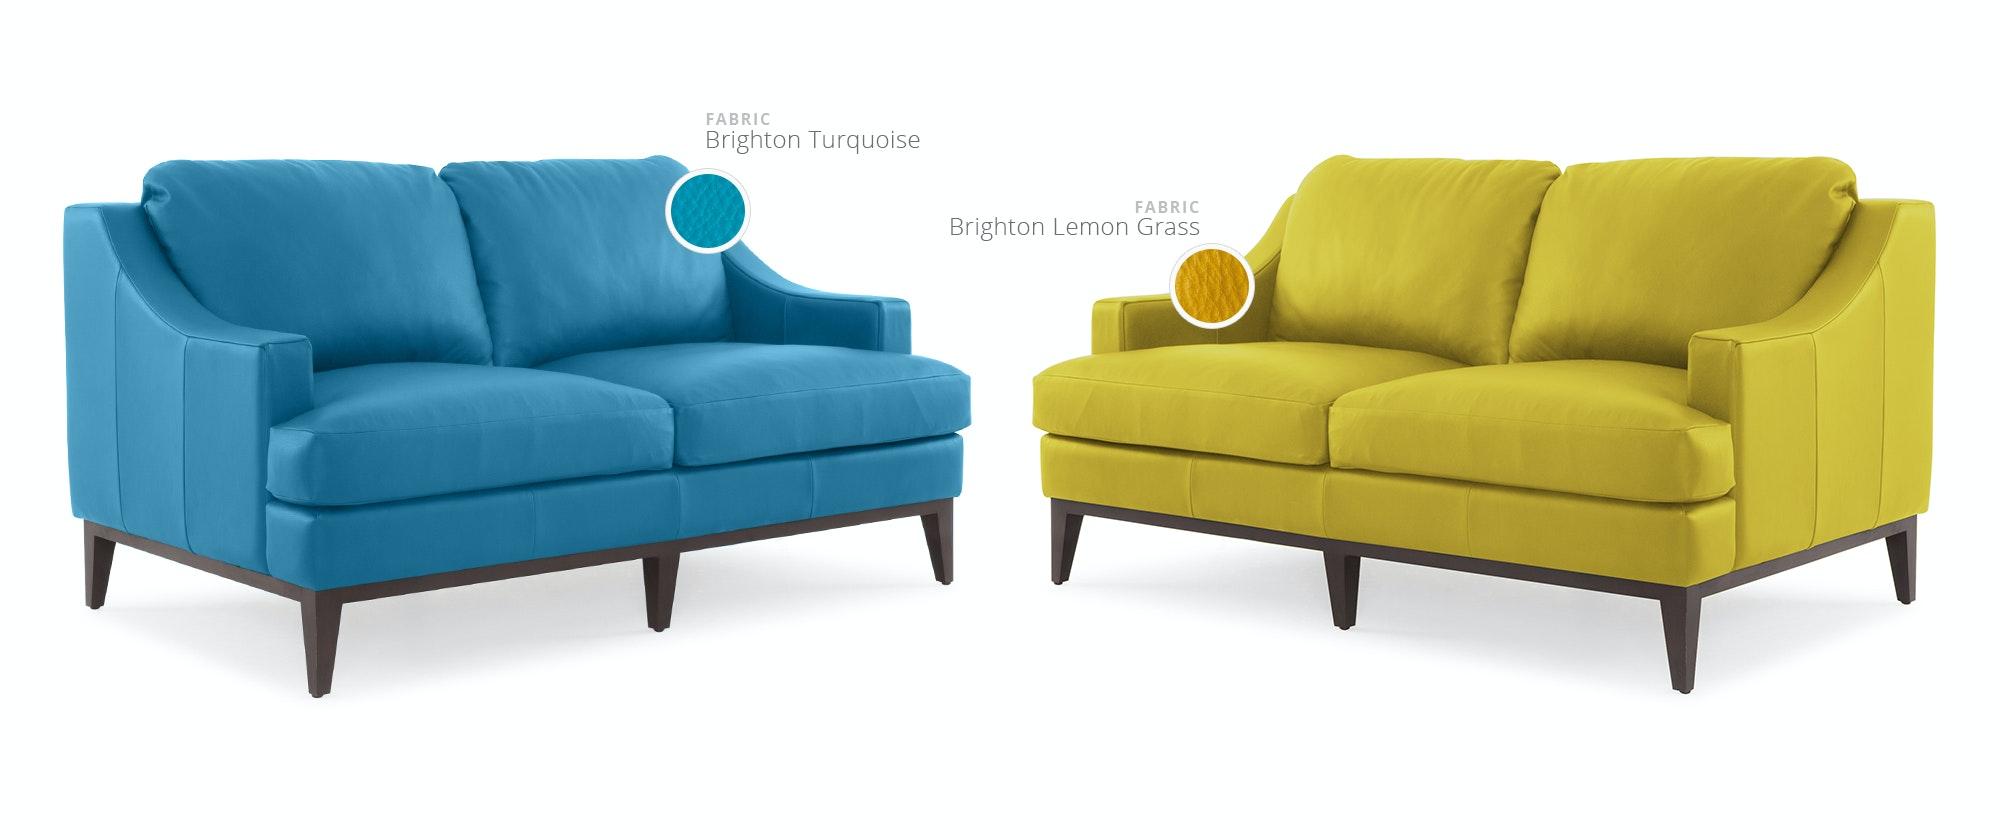 Eq3 Leather Sofa Images Solo Rooms Modern Orange